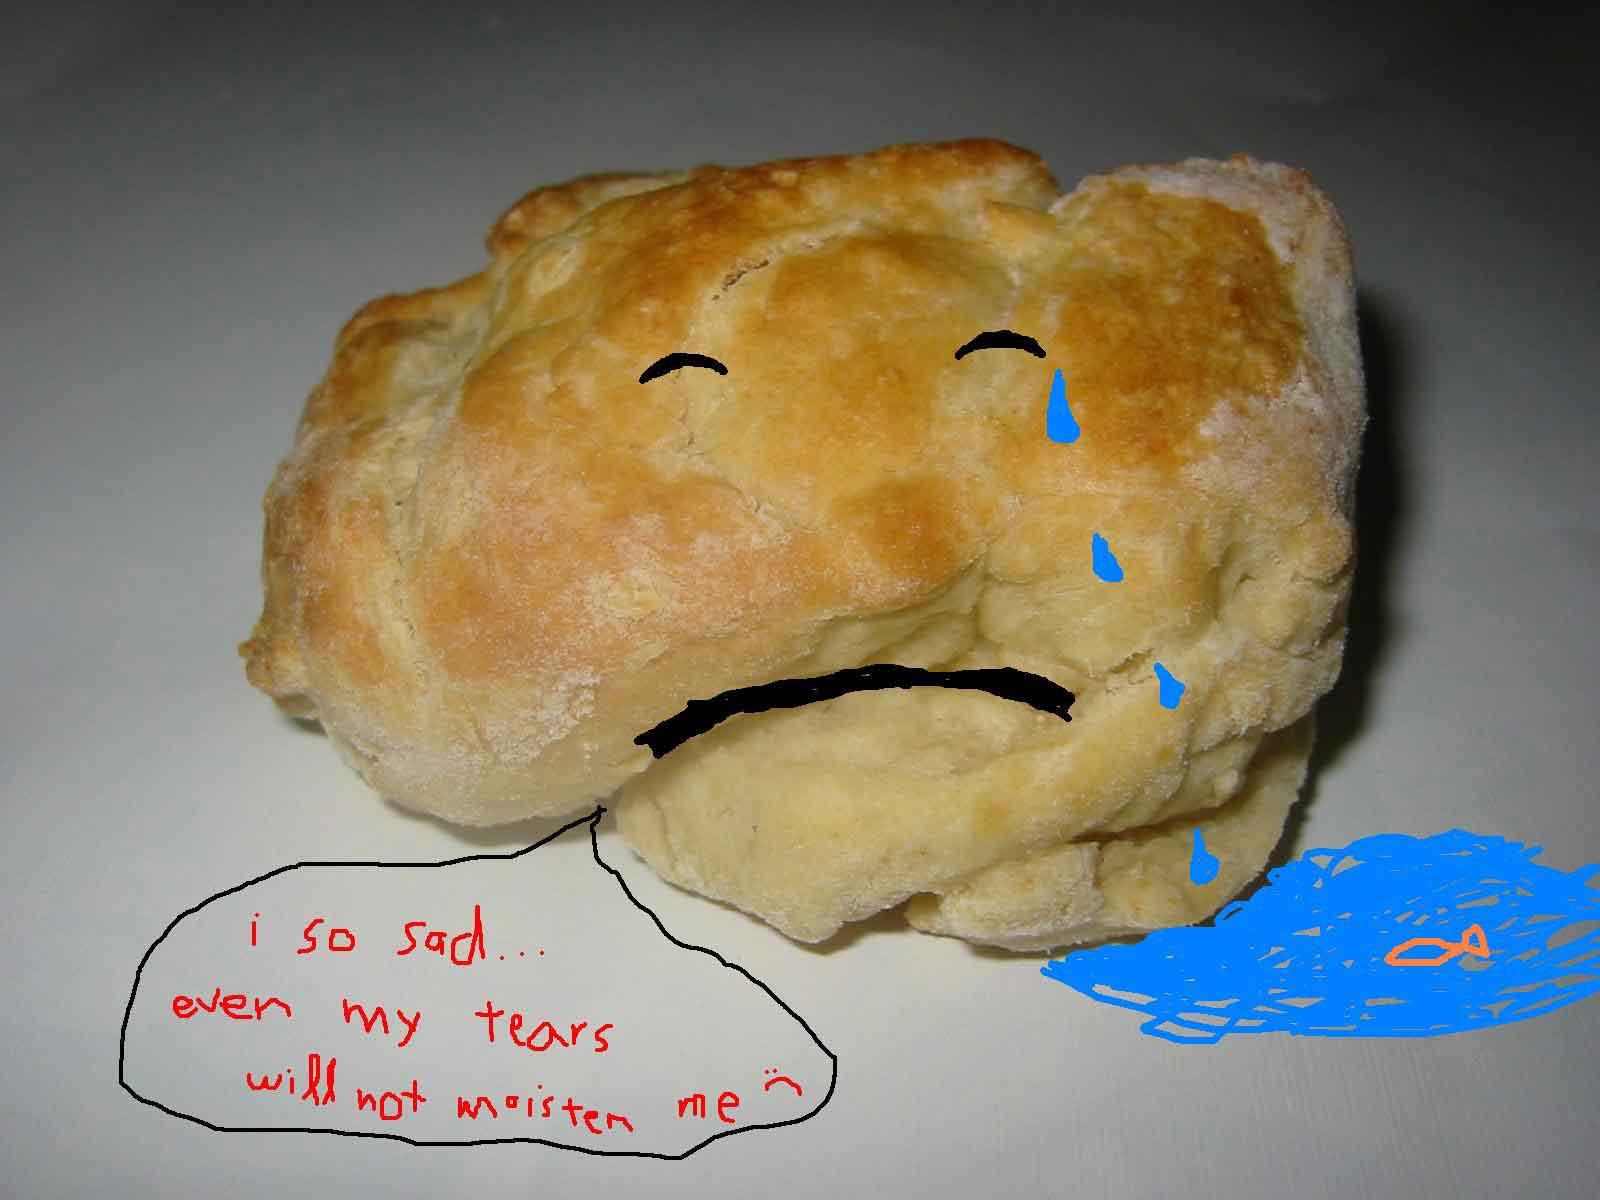 sad scone